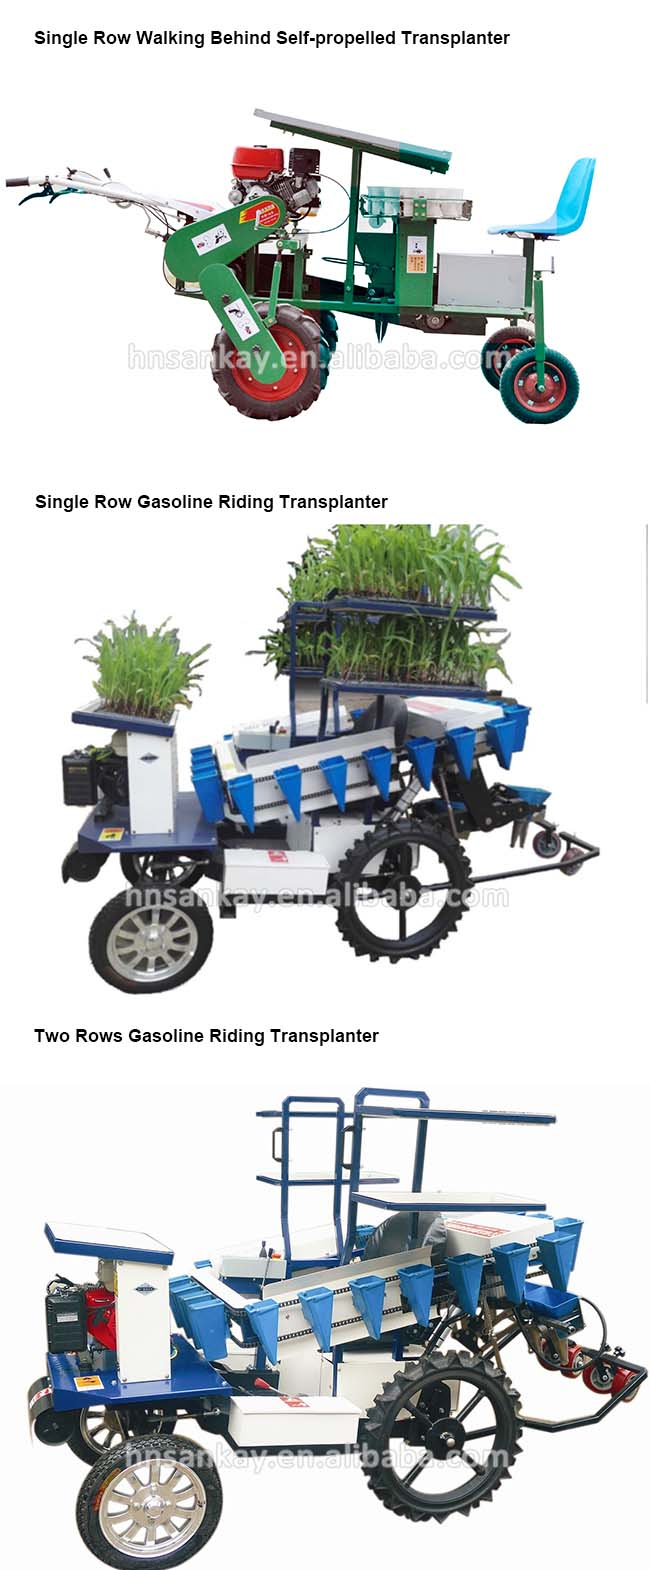 Diesel engine vegetable seeding transplanter for sale